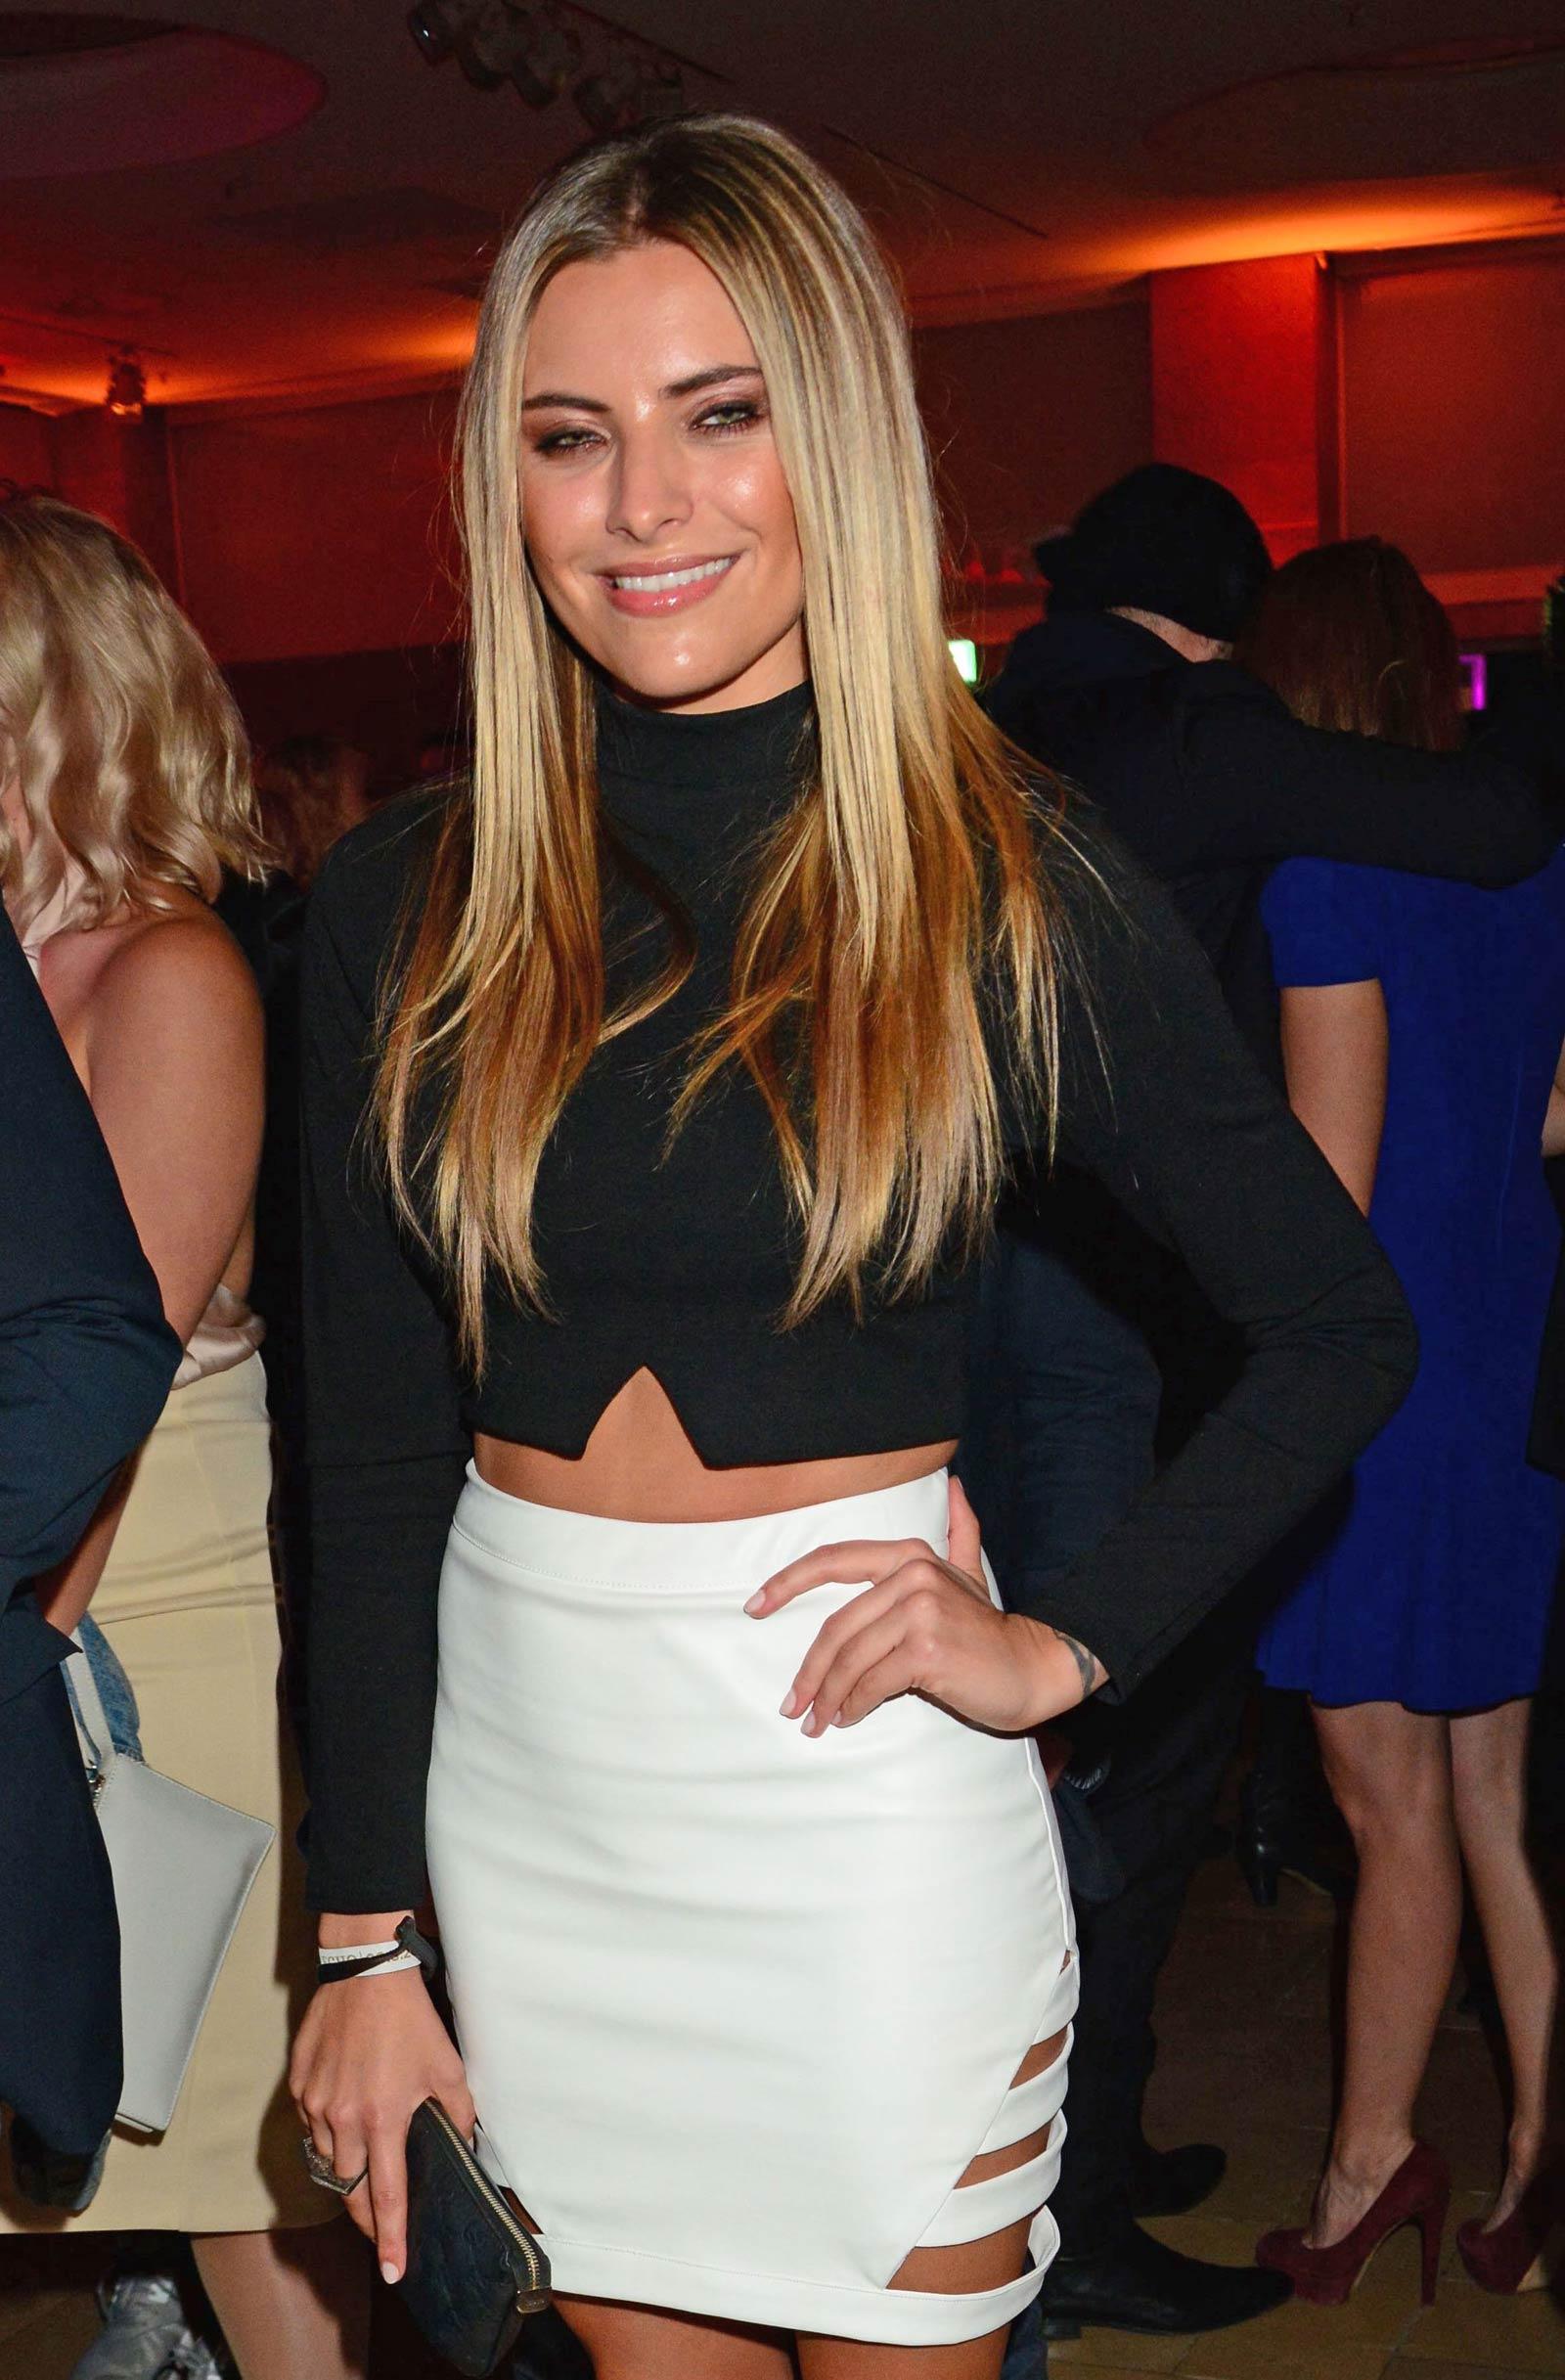 Sophia Thomalla attends the Echo awards 2015